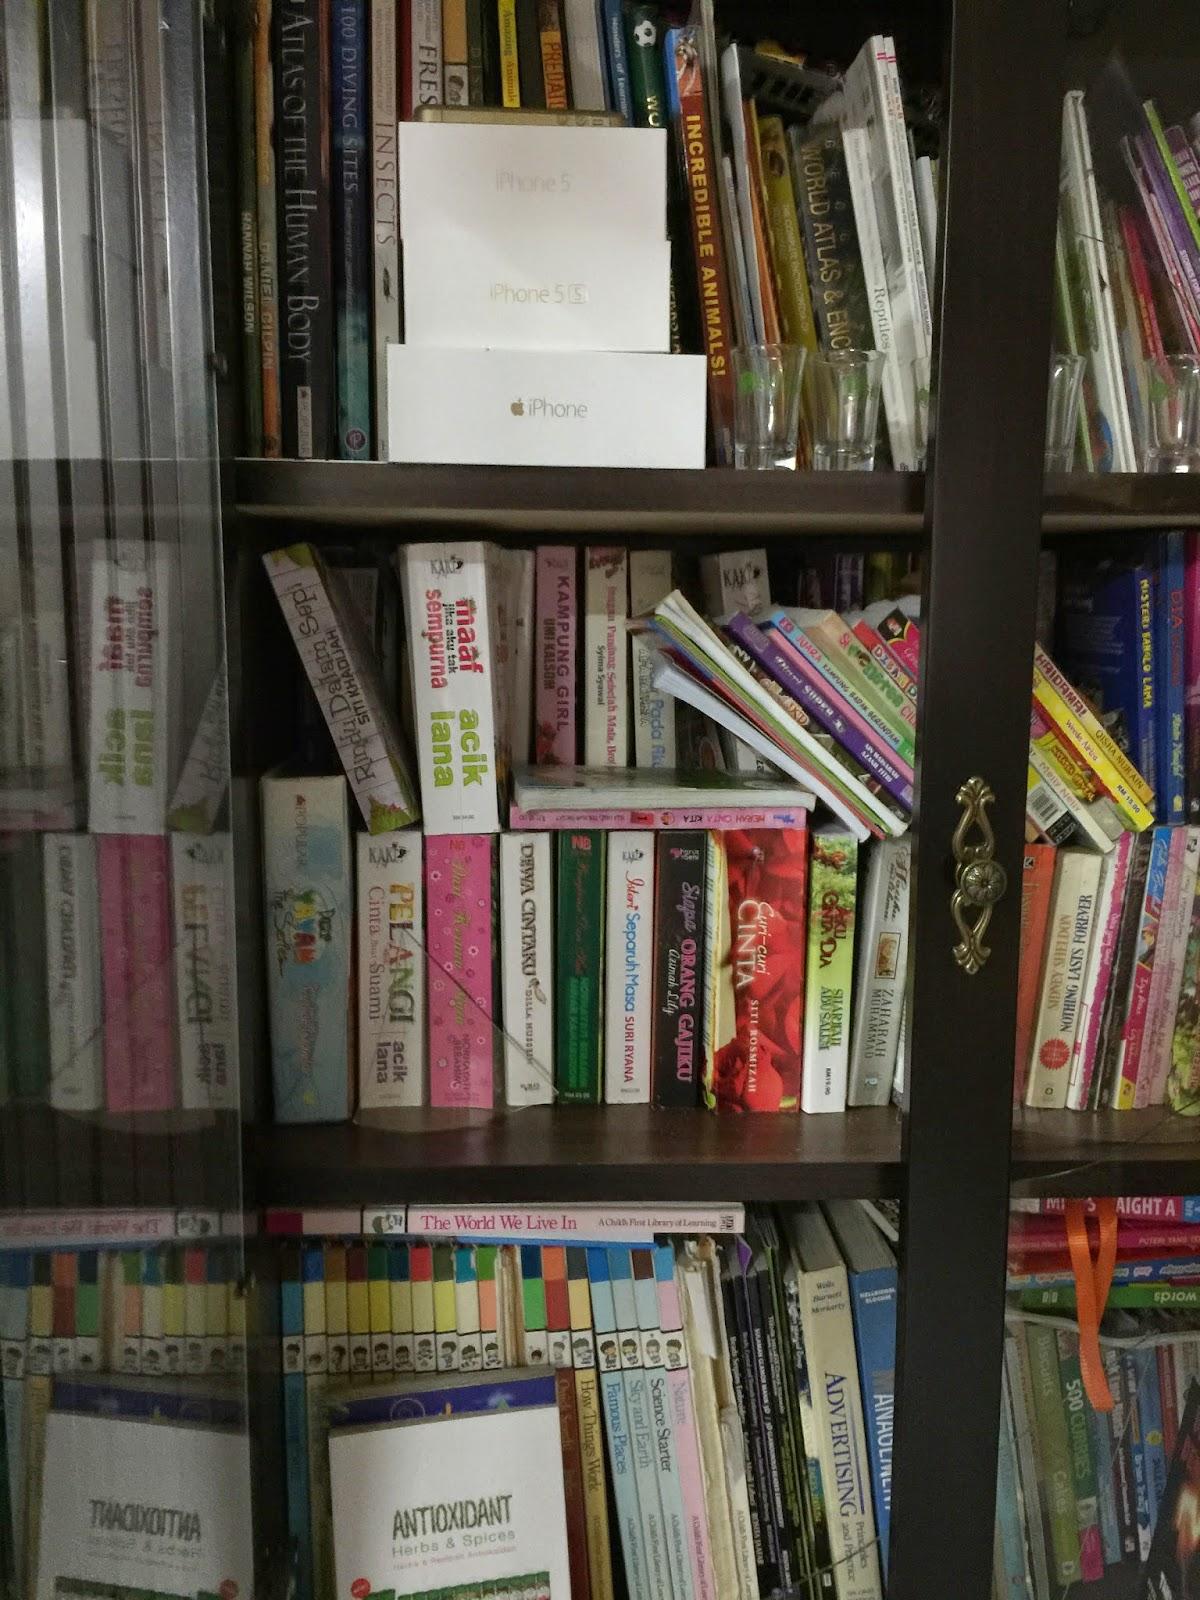 senang, cabaran, buku, novel, library, aktiviti, week end, kedai buku